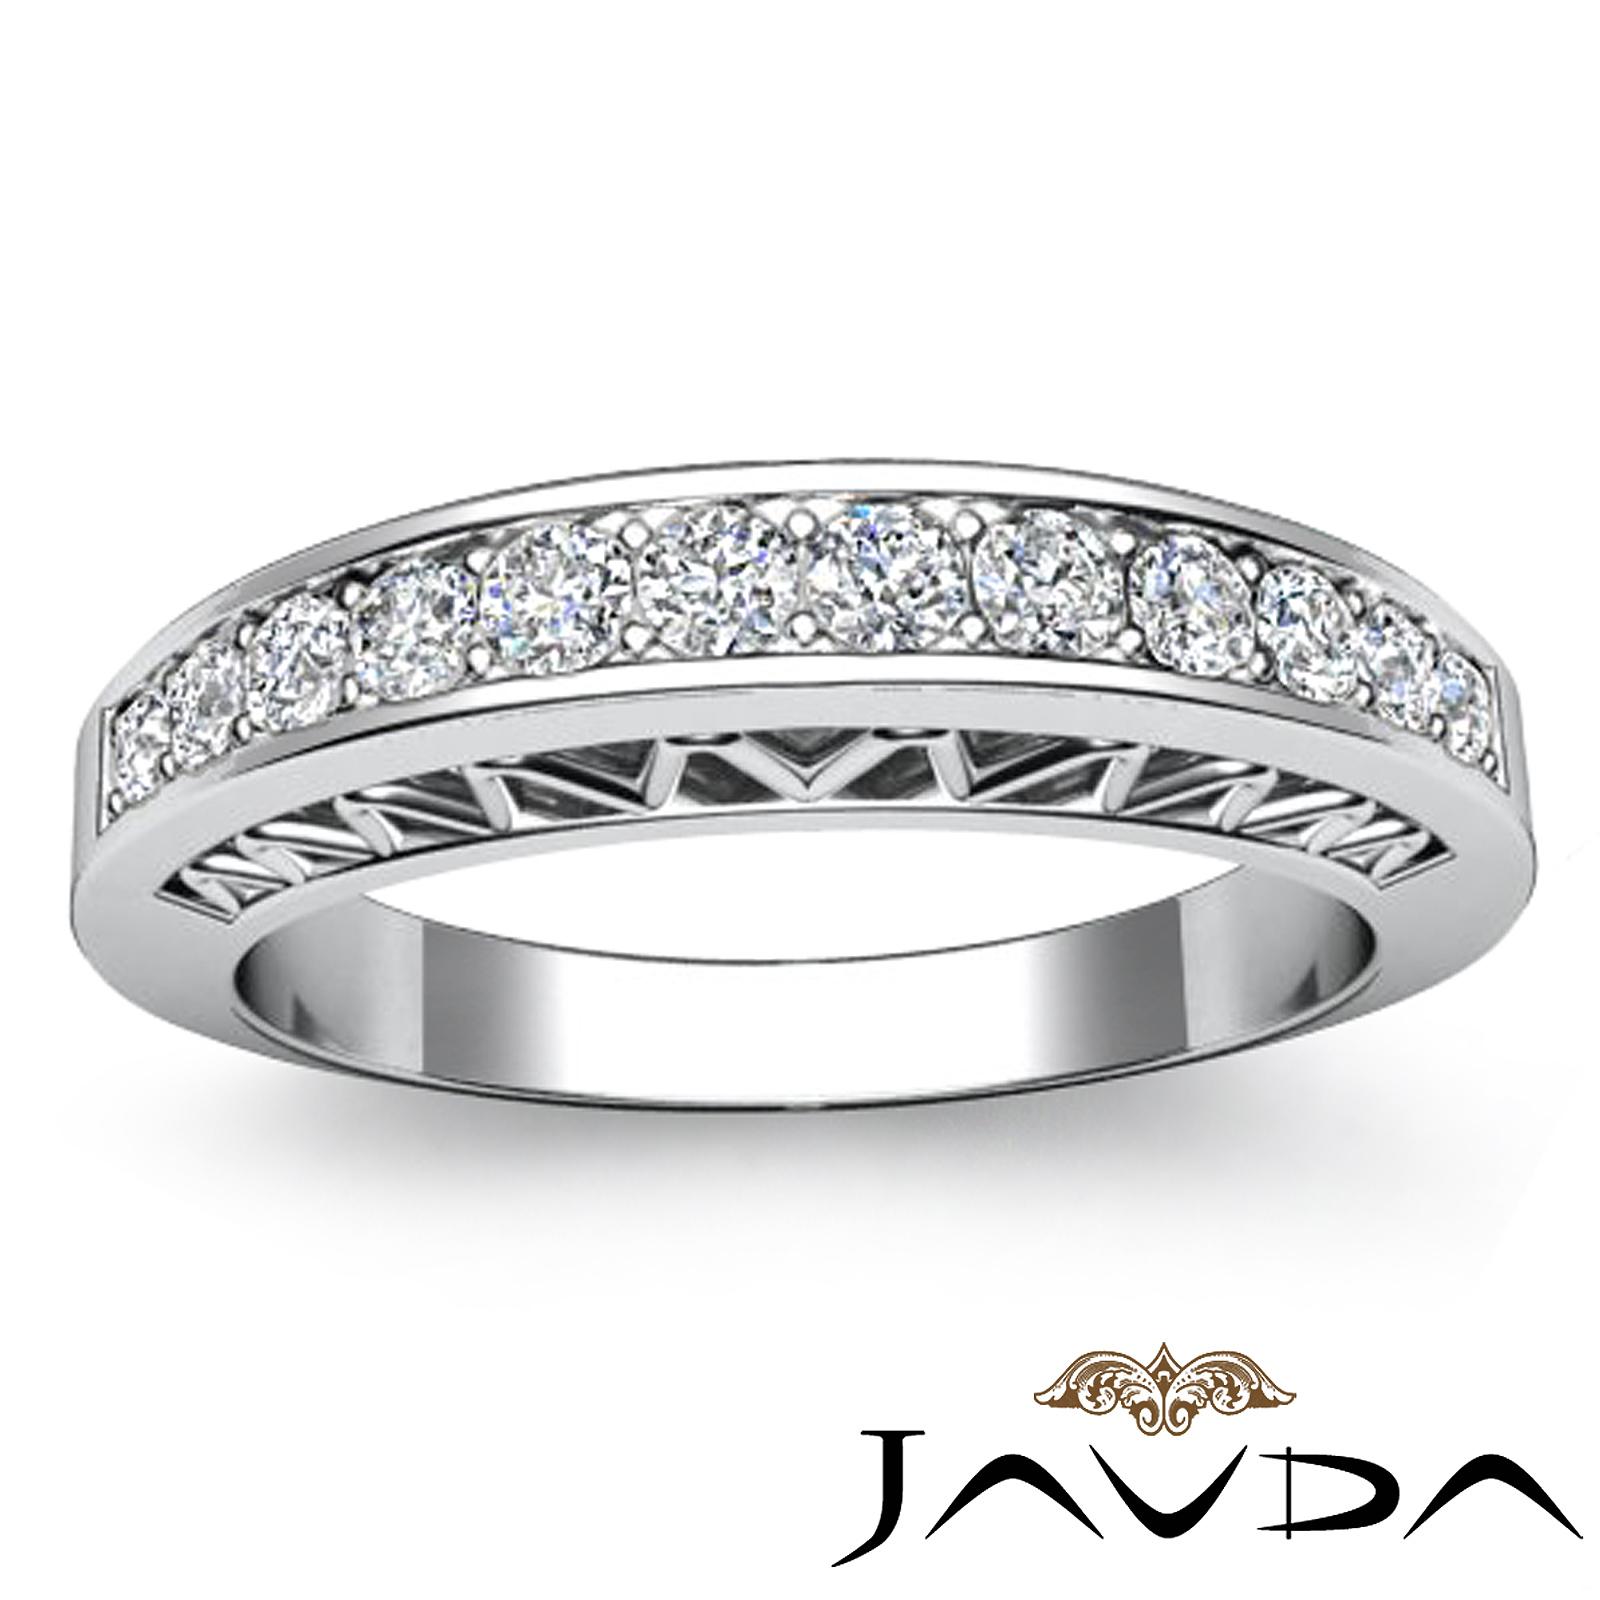 Womens Half Wedding Band Platinum Pave Set Diamond Unique Engagement Ring 025Ct